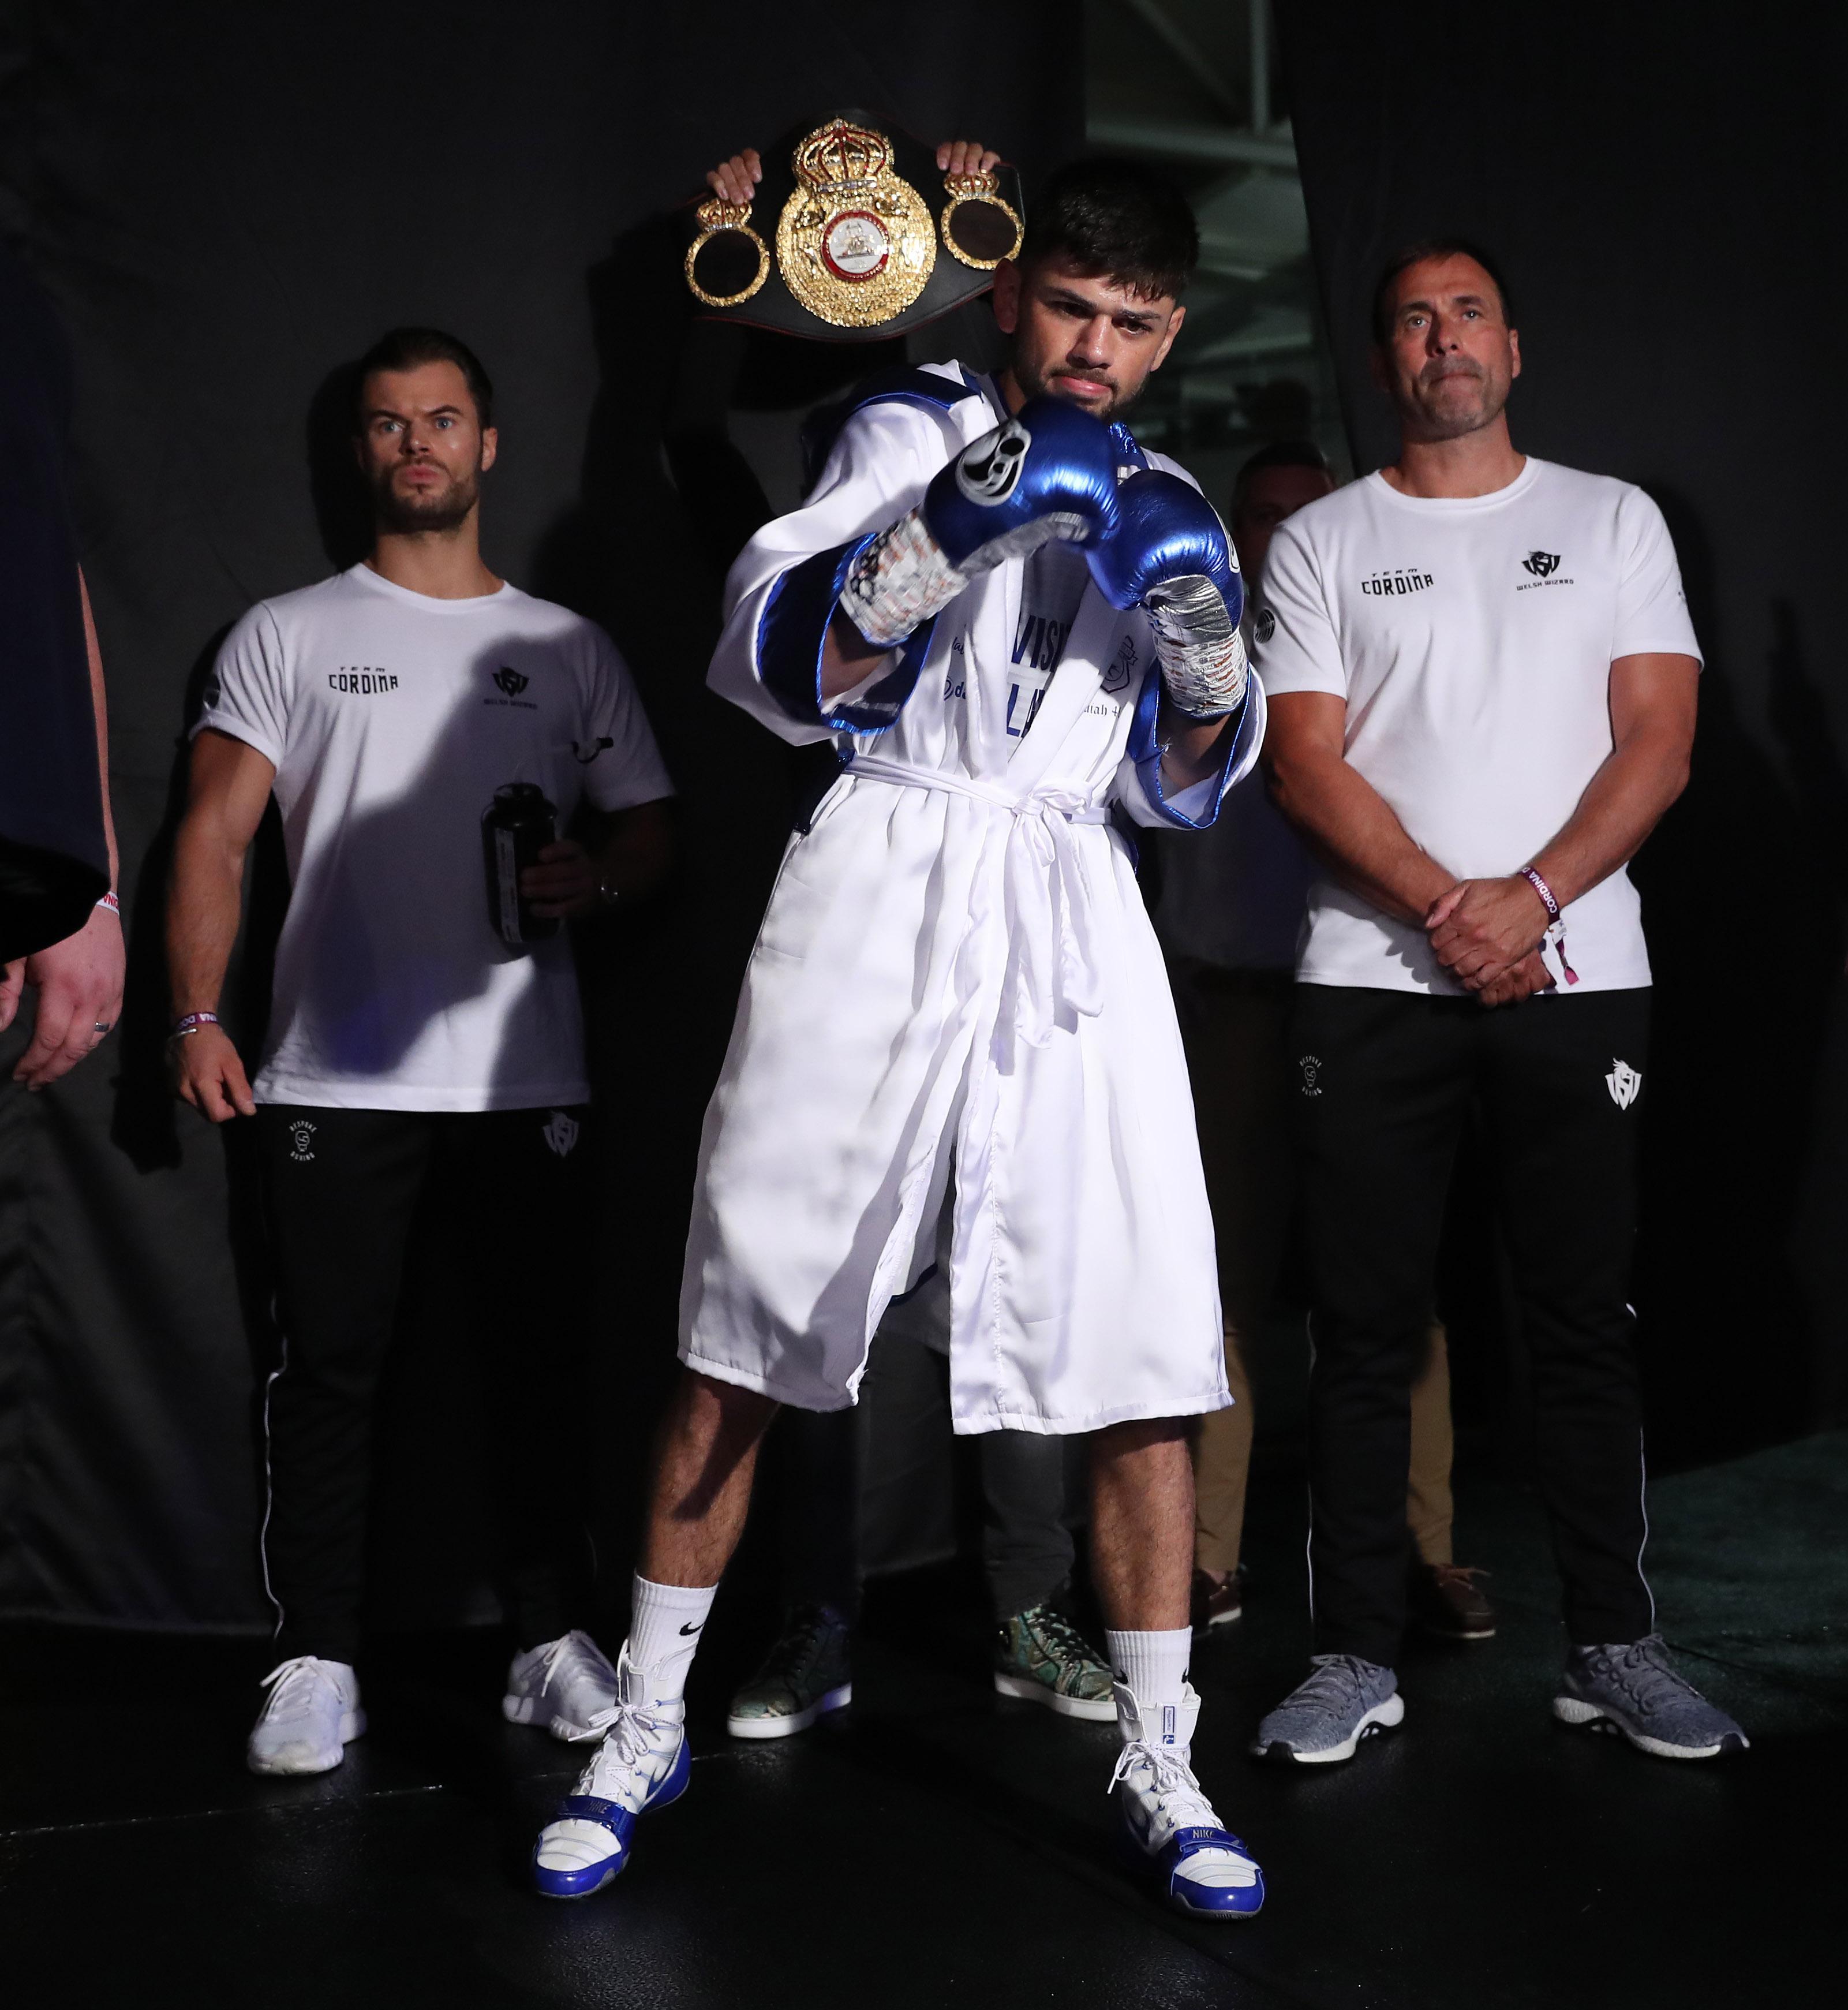 Joe Cordina added the Commonwealth lightweight title to his WBA International lightweight title